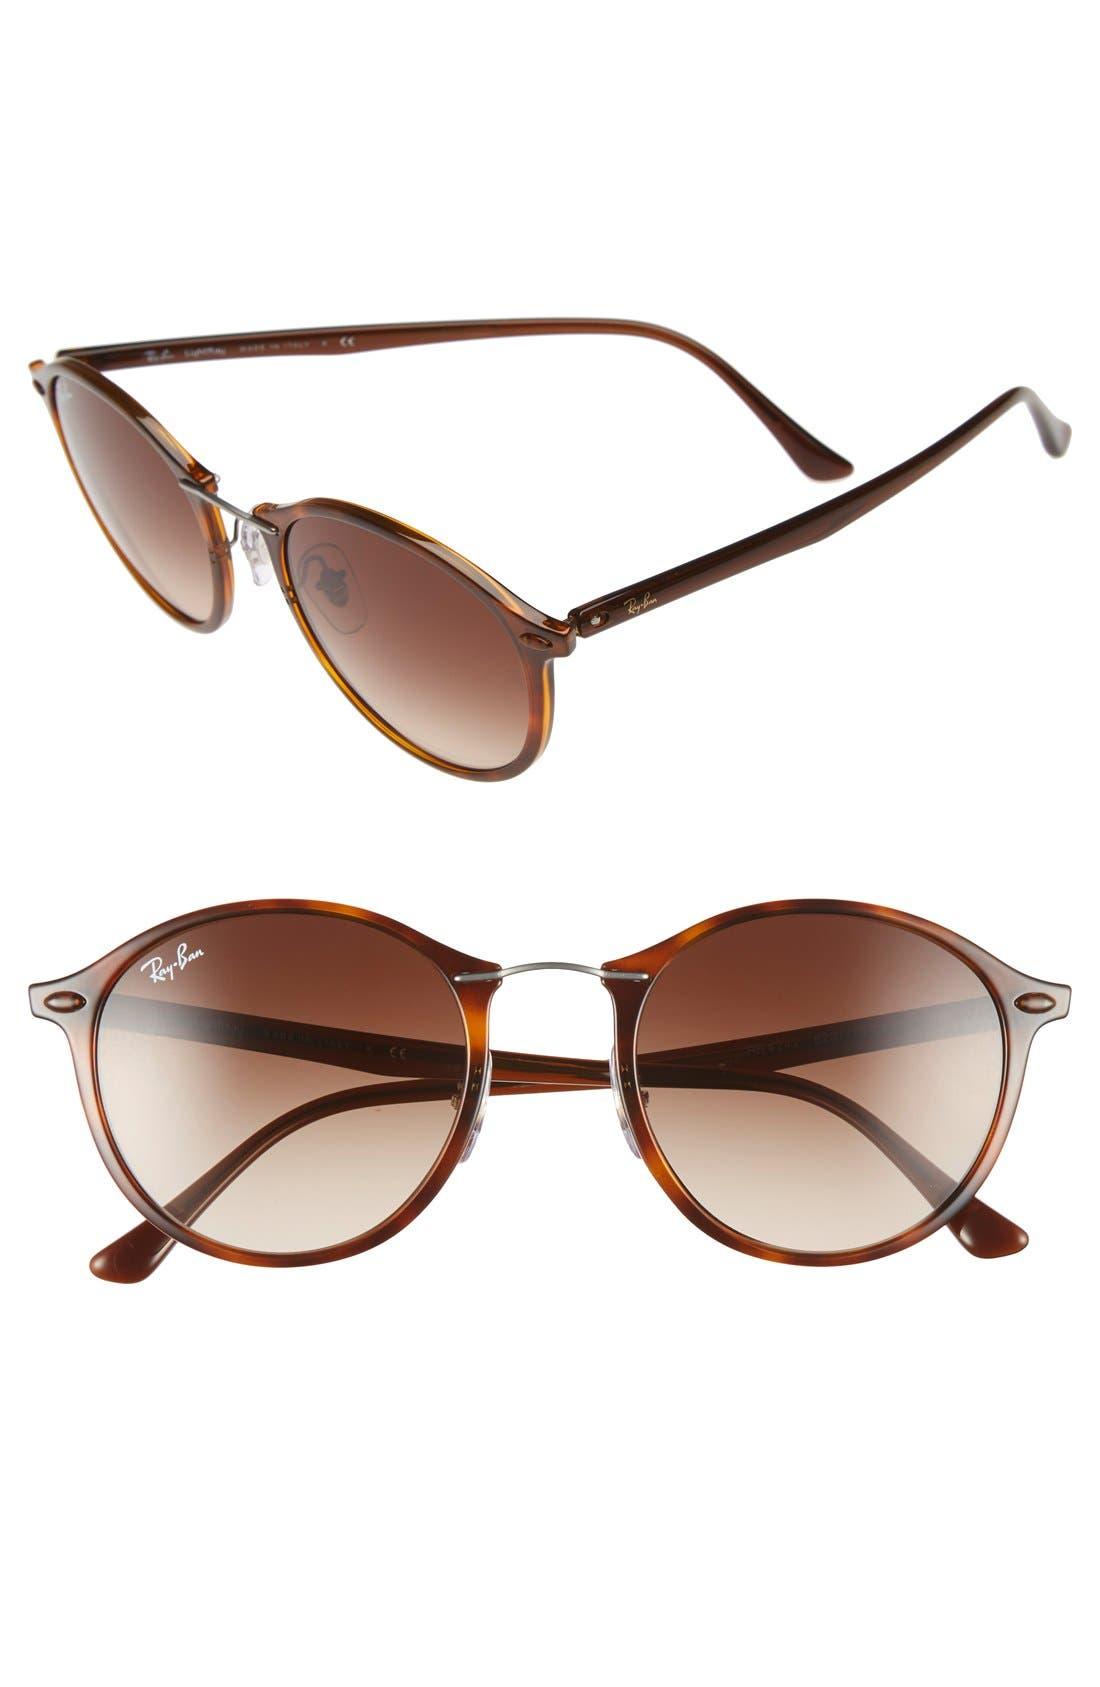 Main Image - Ray-Ban 49mm Round Sunglasses